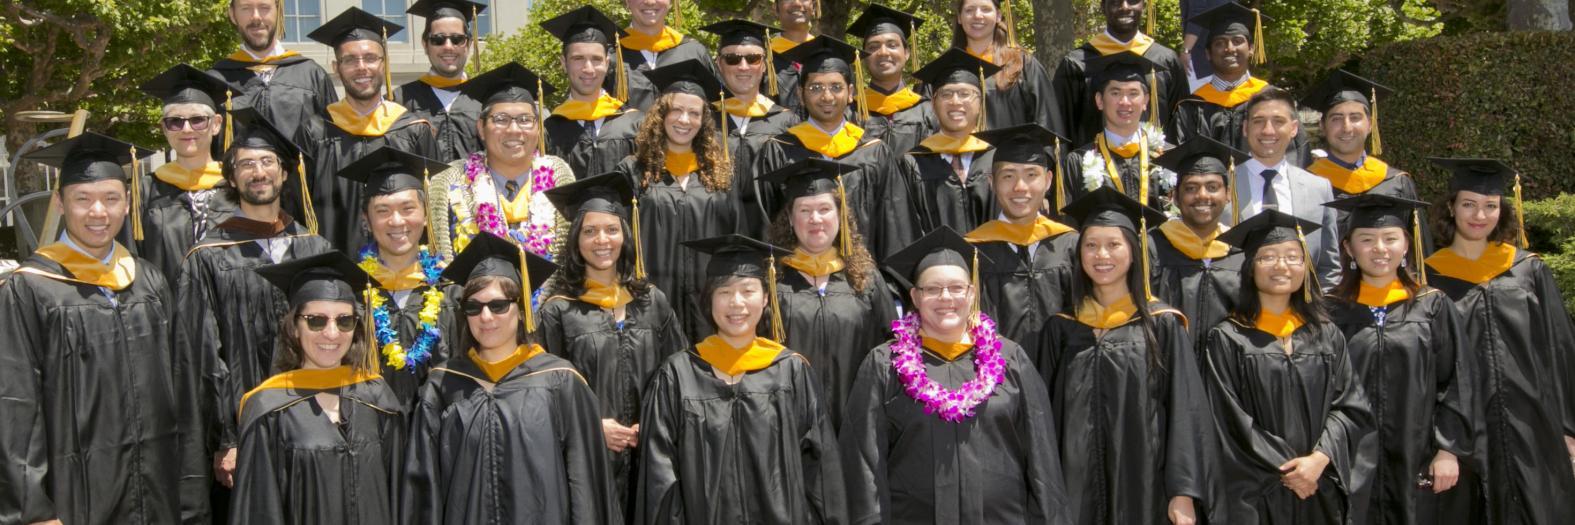 The School of Information graduating class of 2013.